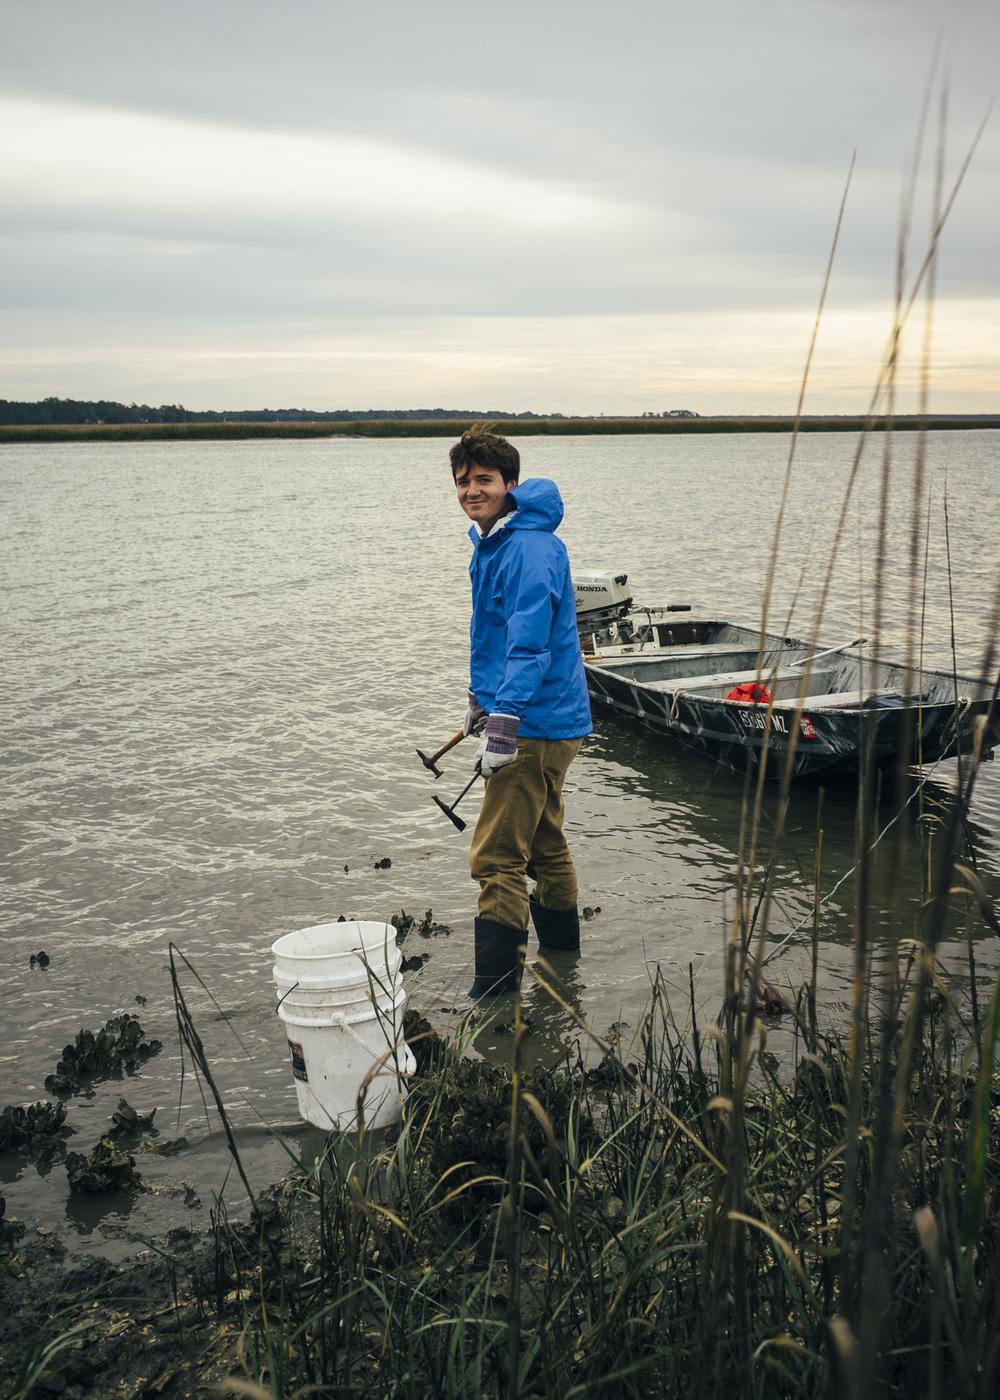 edisto-island-oyster-harvesting-marsh-vernie.jpg